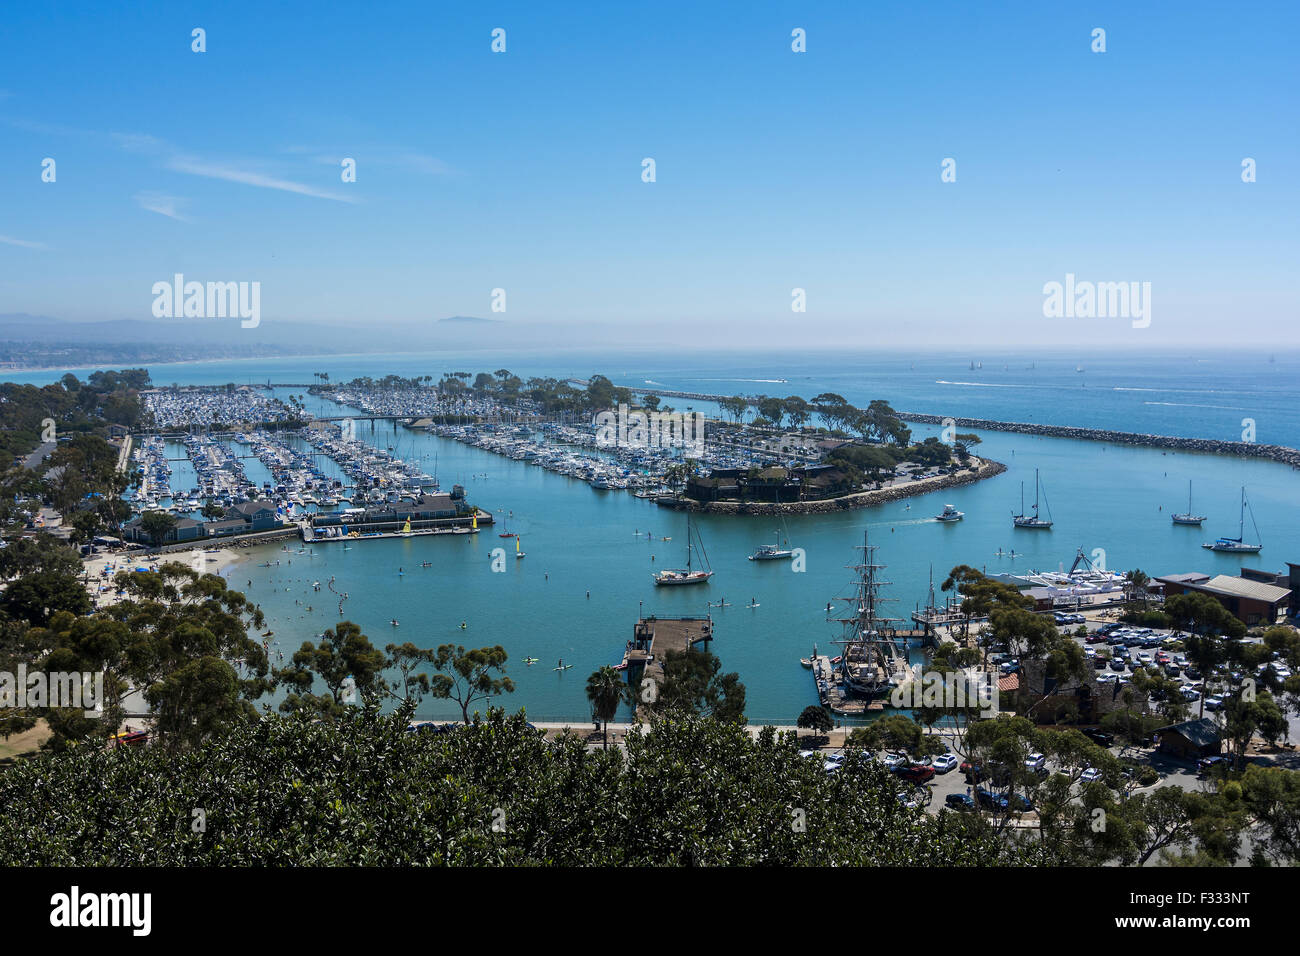 A wide angle shot of Dana Point harbor and marina, Dana Point, California, U.S.A. - Stock Image